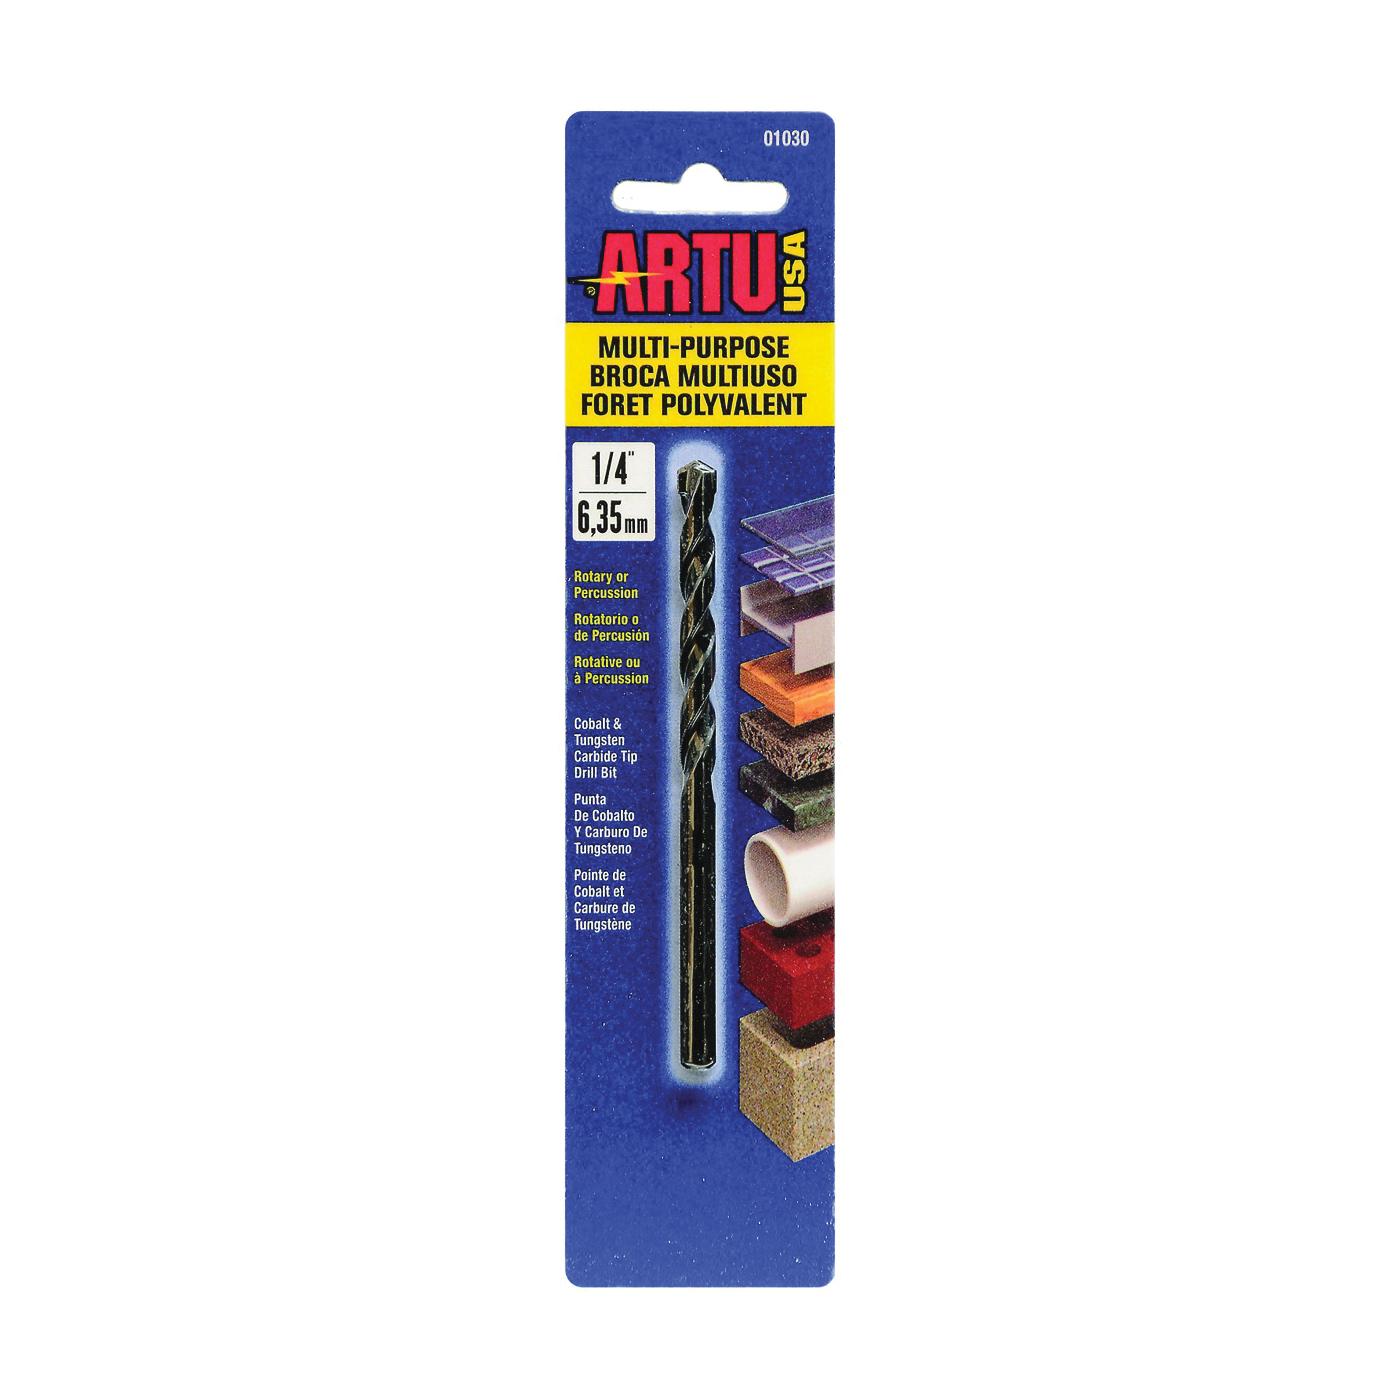 Picture of ARTU 01030 Drill Bit, 1/4 in Dia, 4-1/8 in OAL, Jobber Bit, Parabolic Flute, 1/4 in Dia Shank, Straight Shank